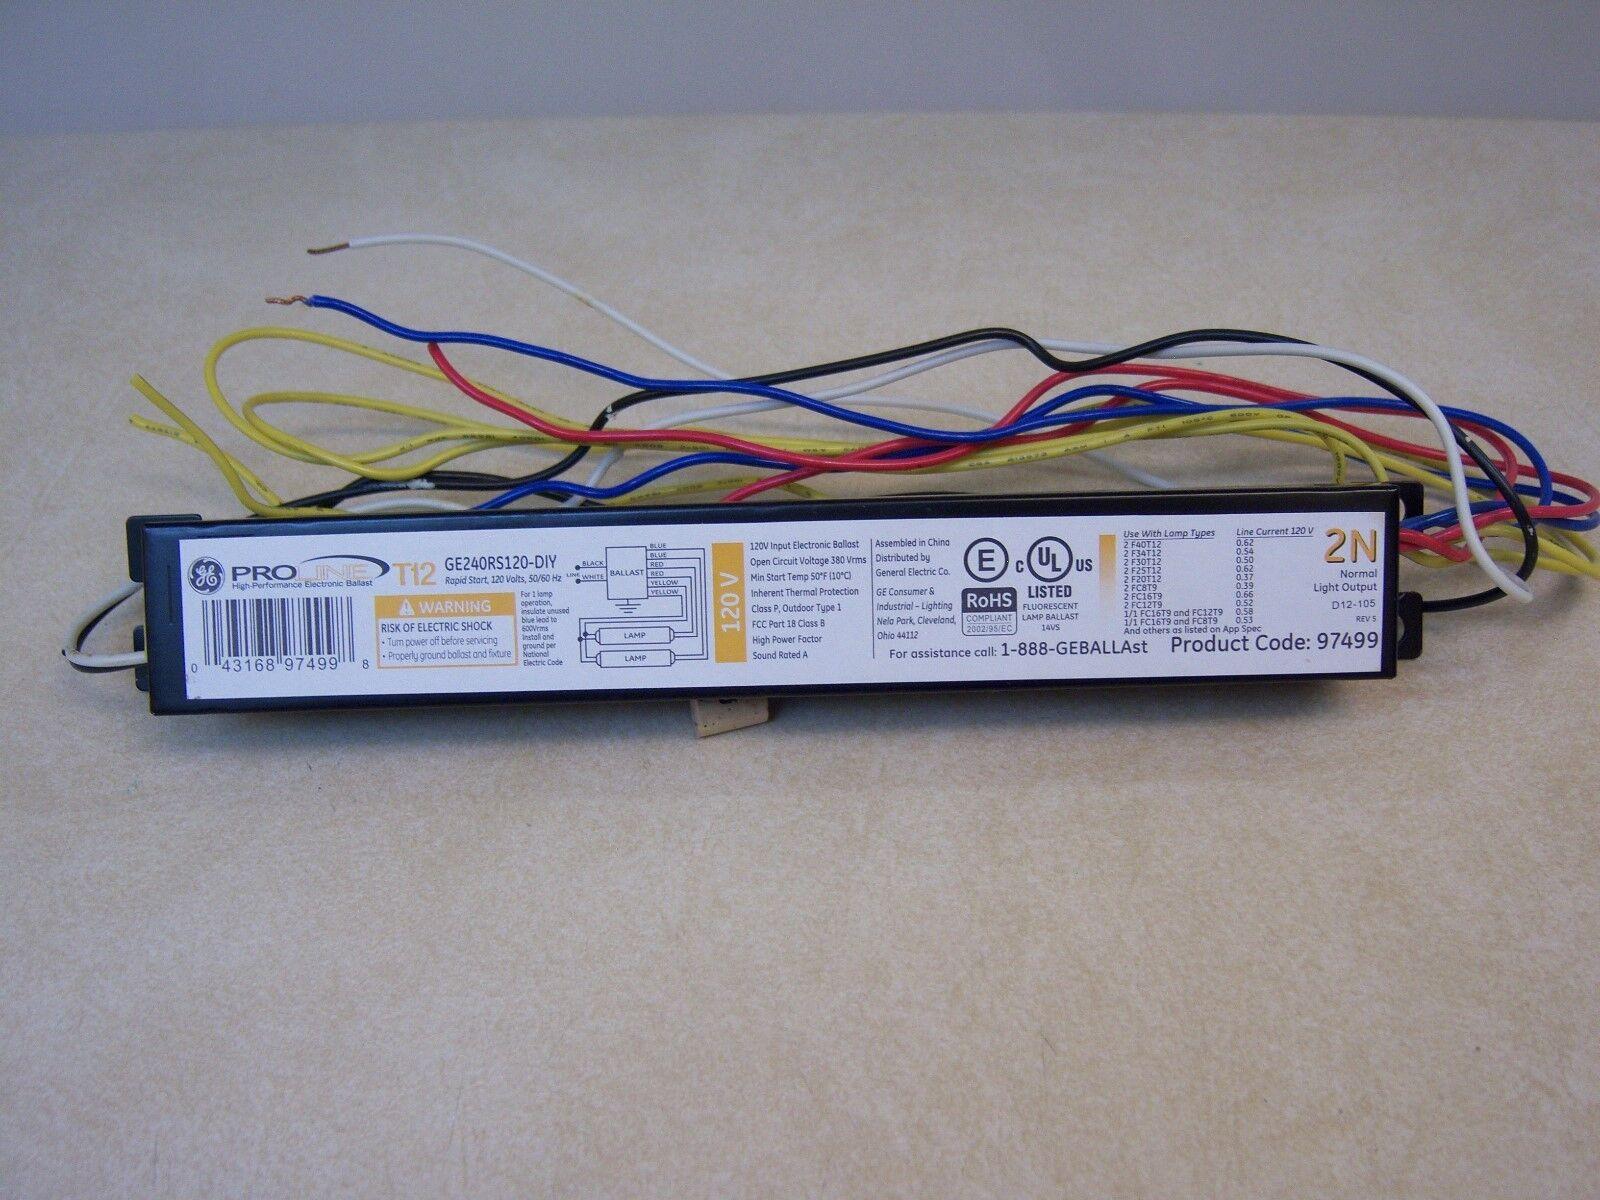 Clippard CINTI.0 Cylinder Sensor CINTI.O CINTI0 CINTI 3-Wire red white black New